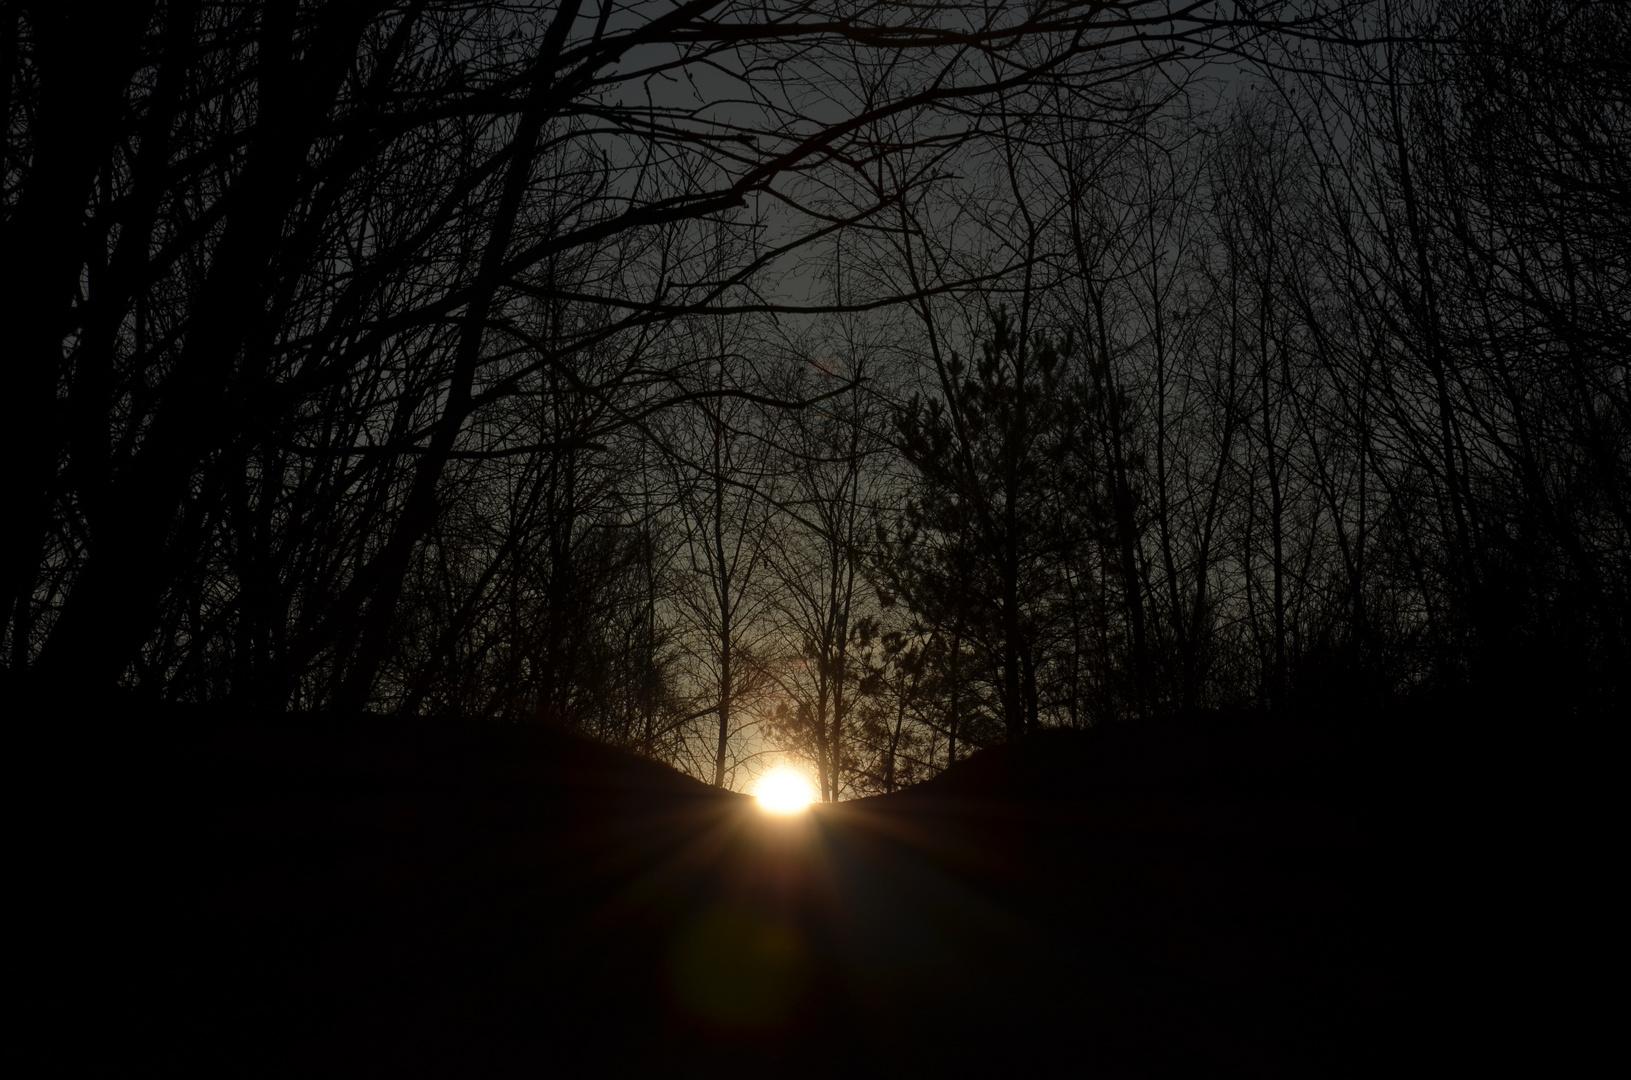 Sunset in Dudelange(LUX)